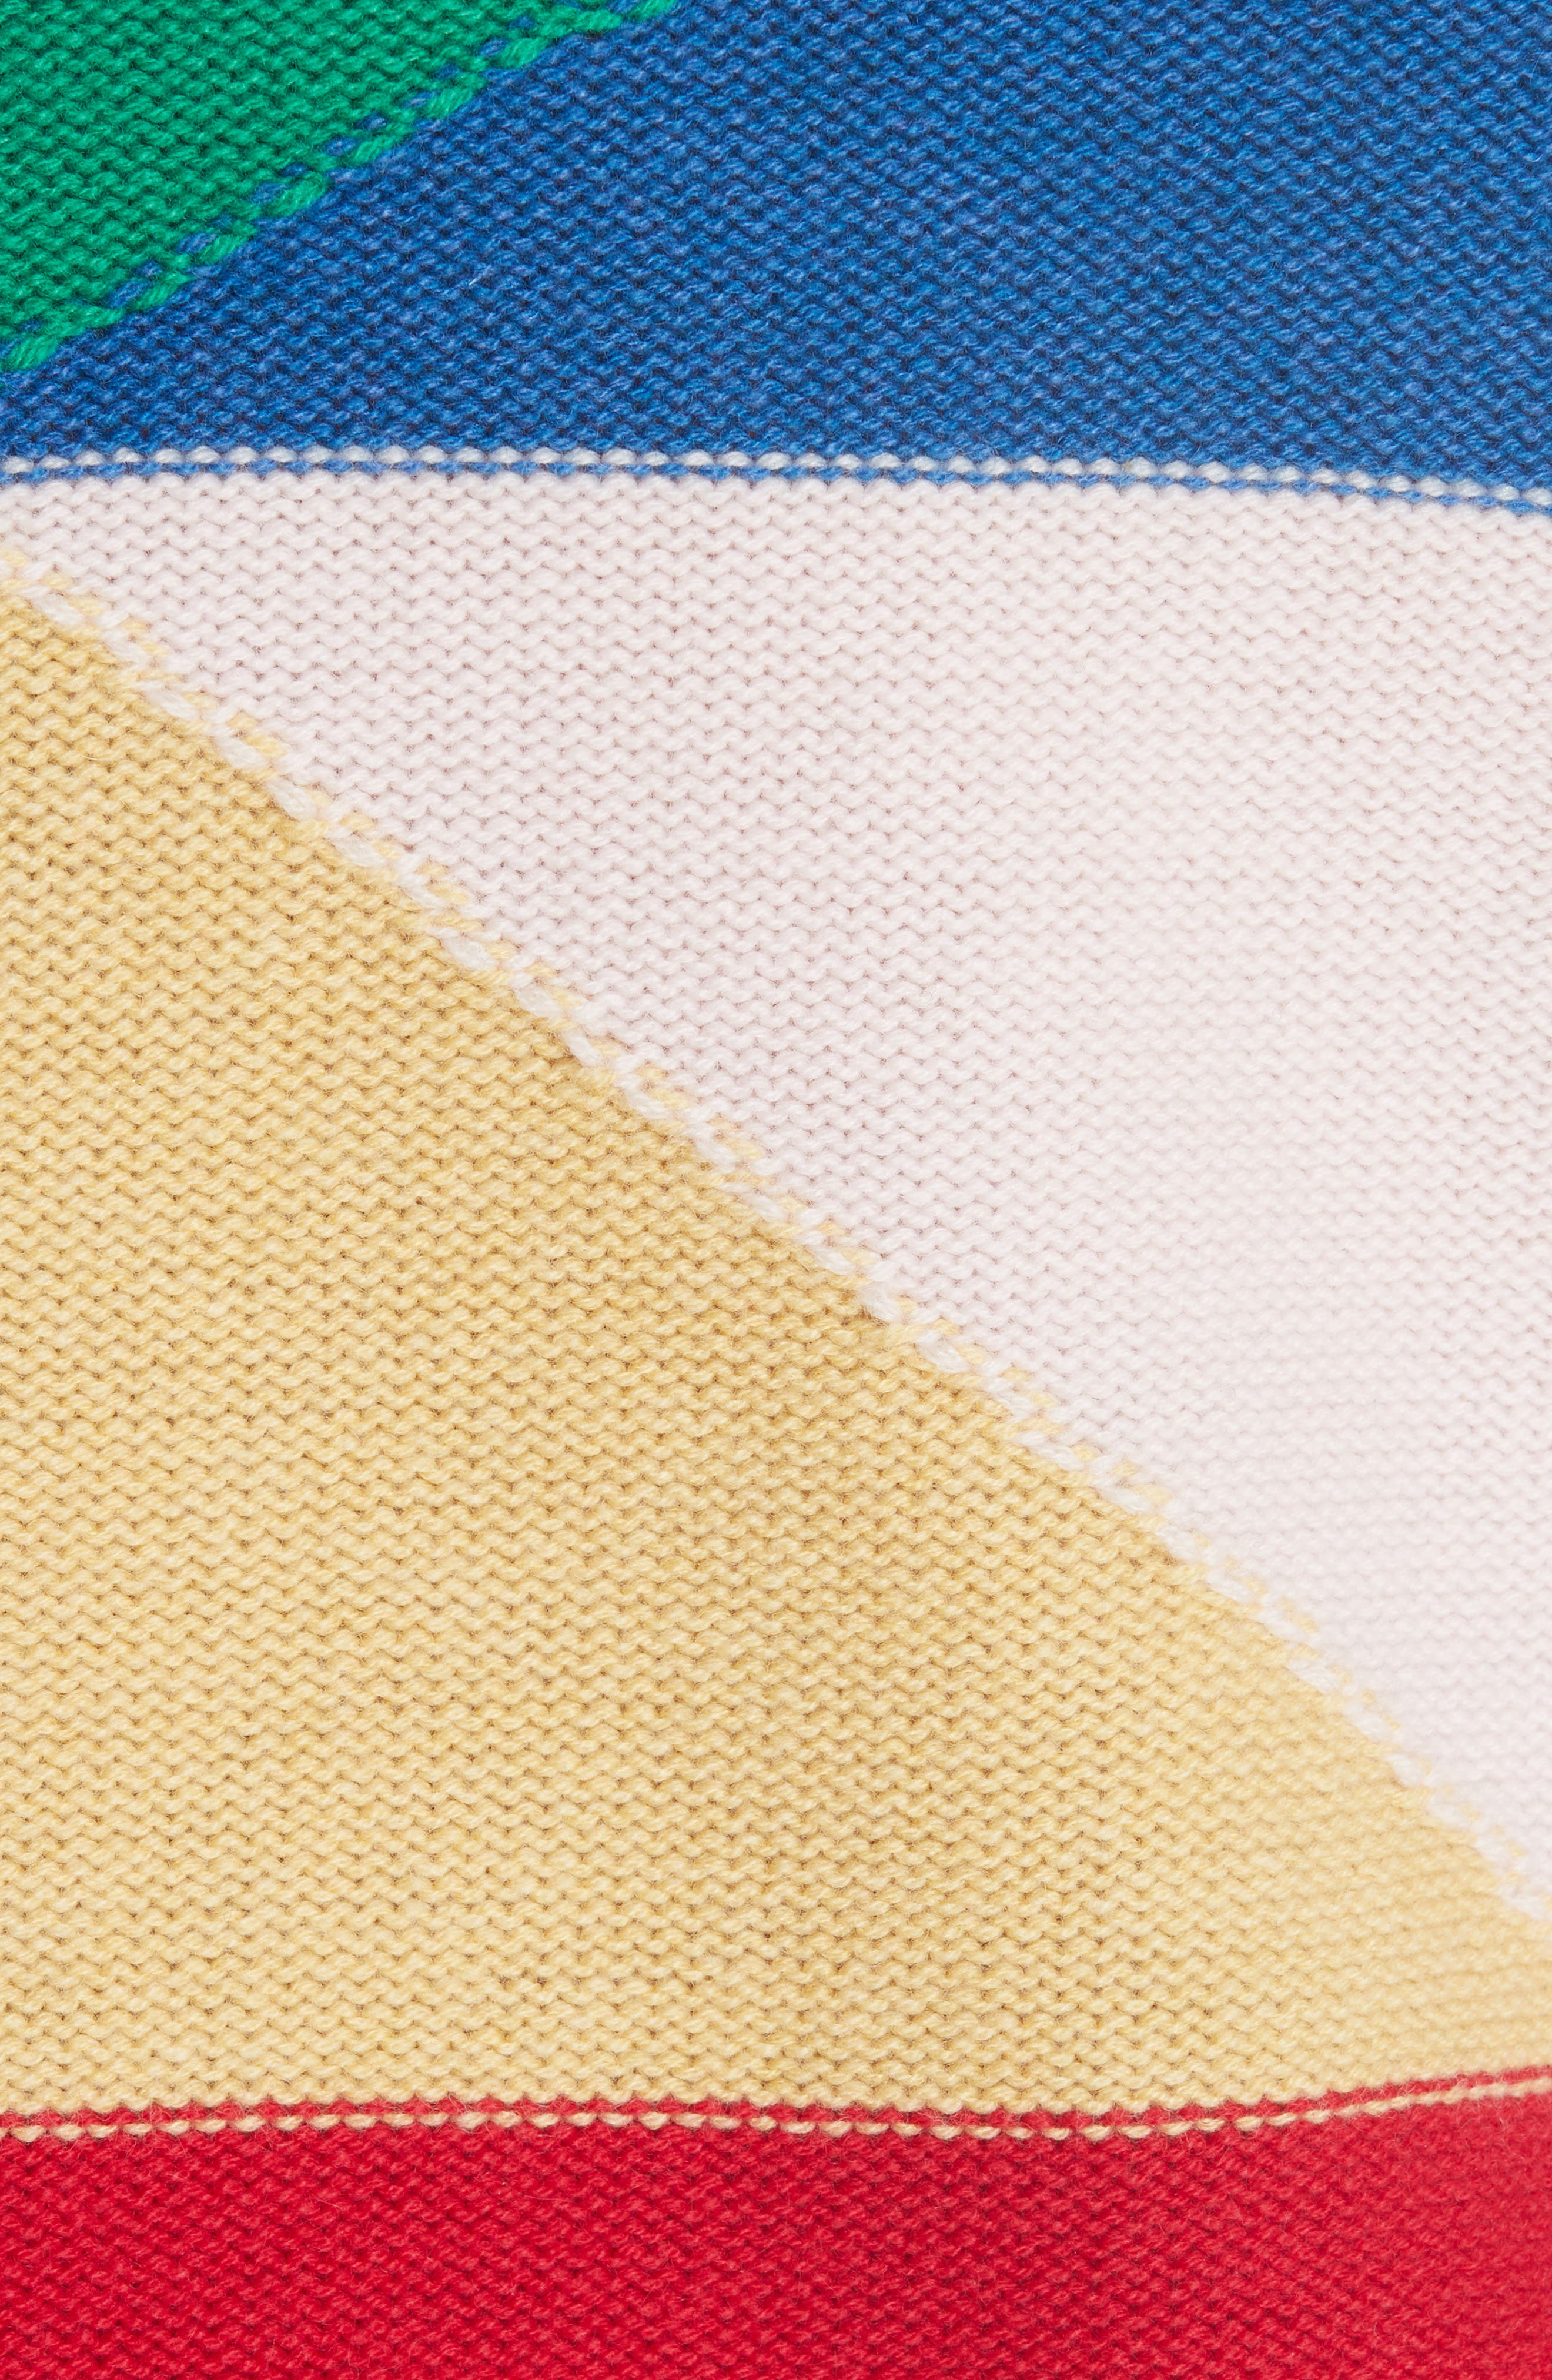 Megu Colorblock Wool & Cashmere Sweater,                             Alternate thumbnail 3, color,                             Multi